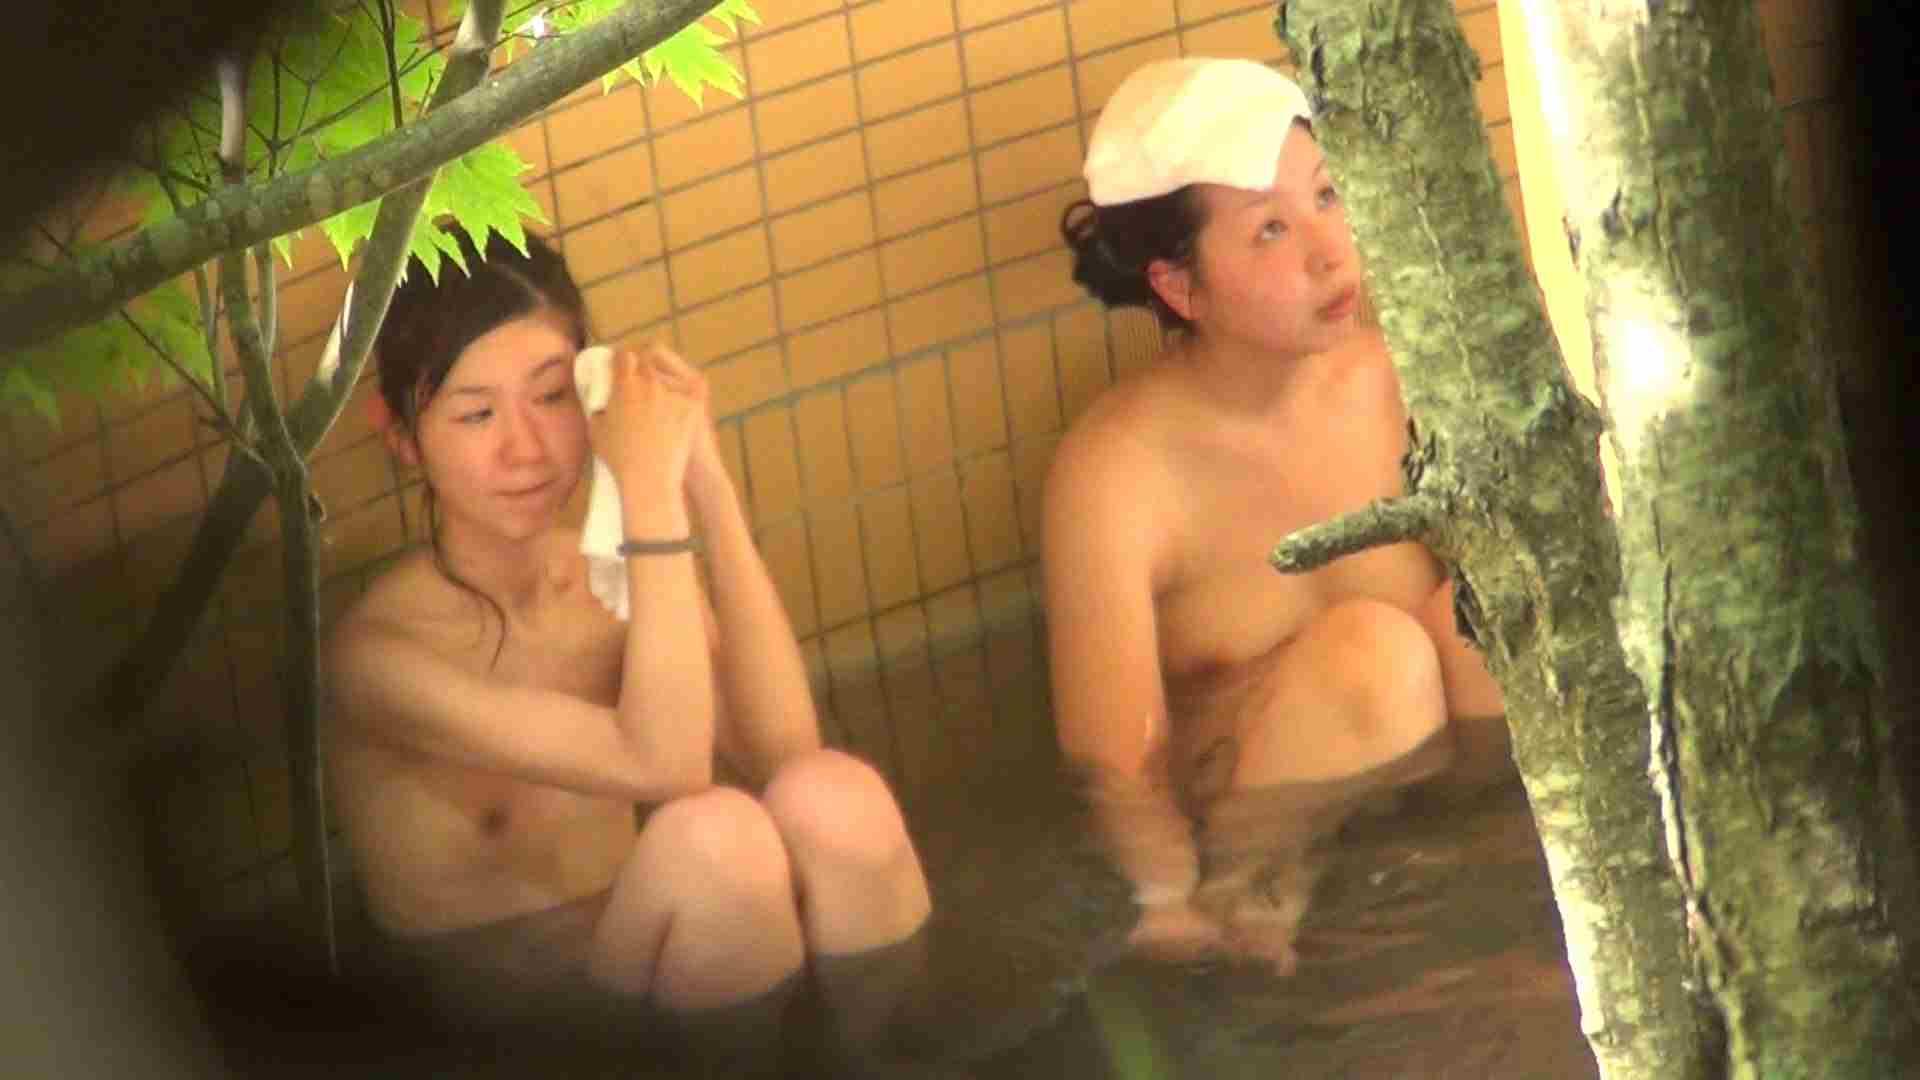 Aquaな露天風呂Vol.307 OLのエロ生活 | 露天風呂  30連発 19